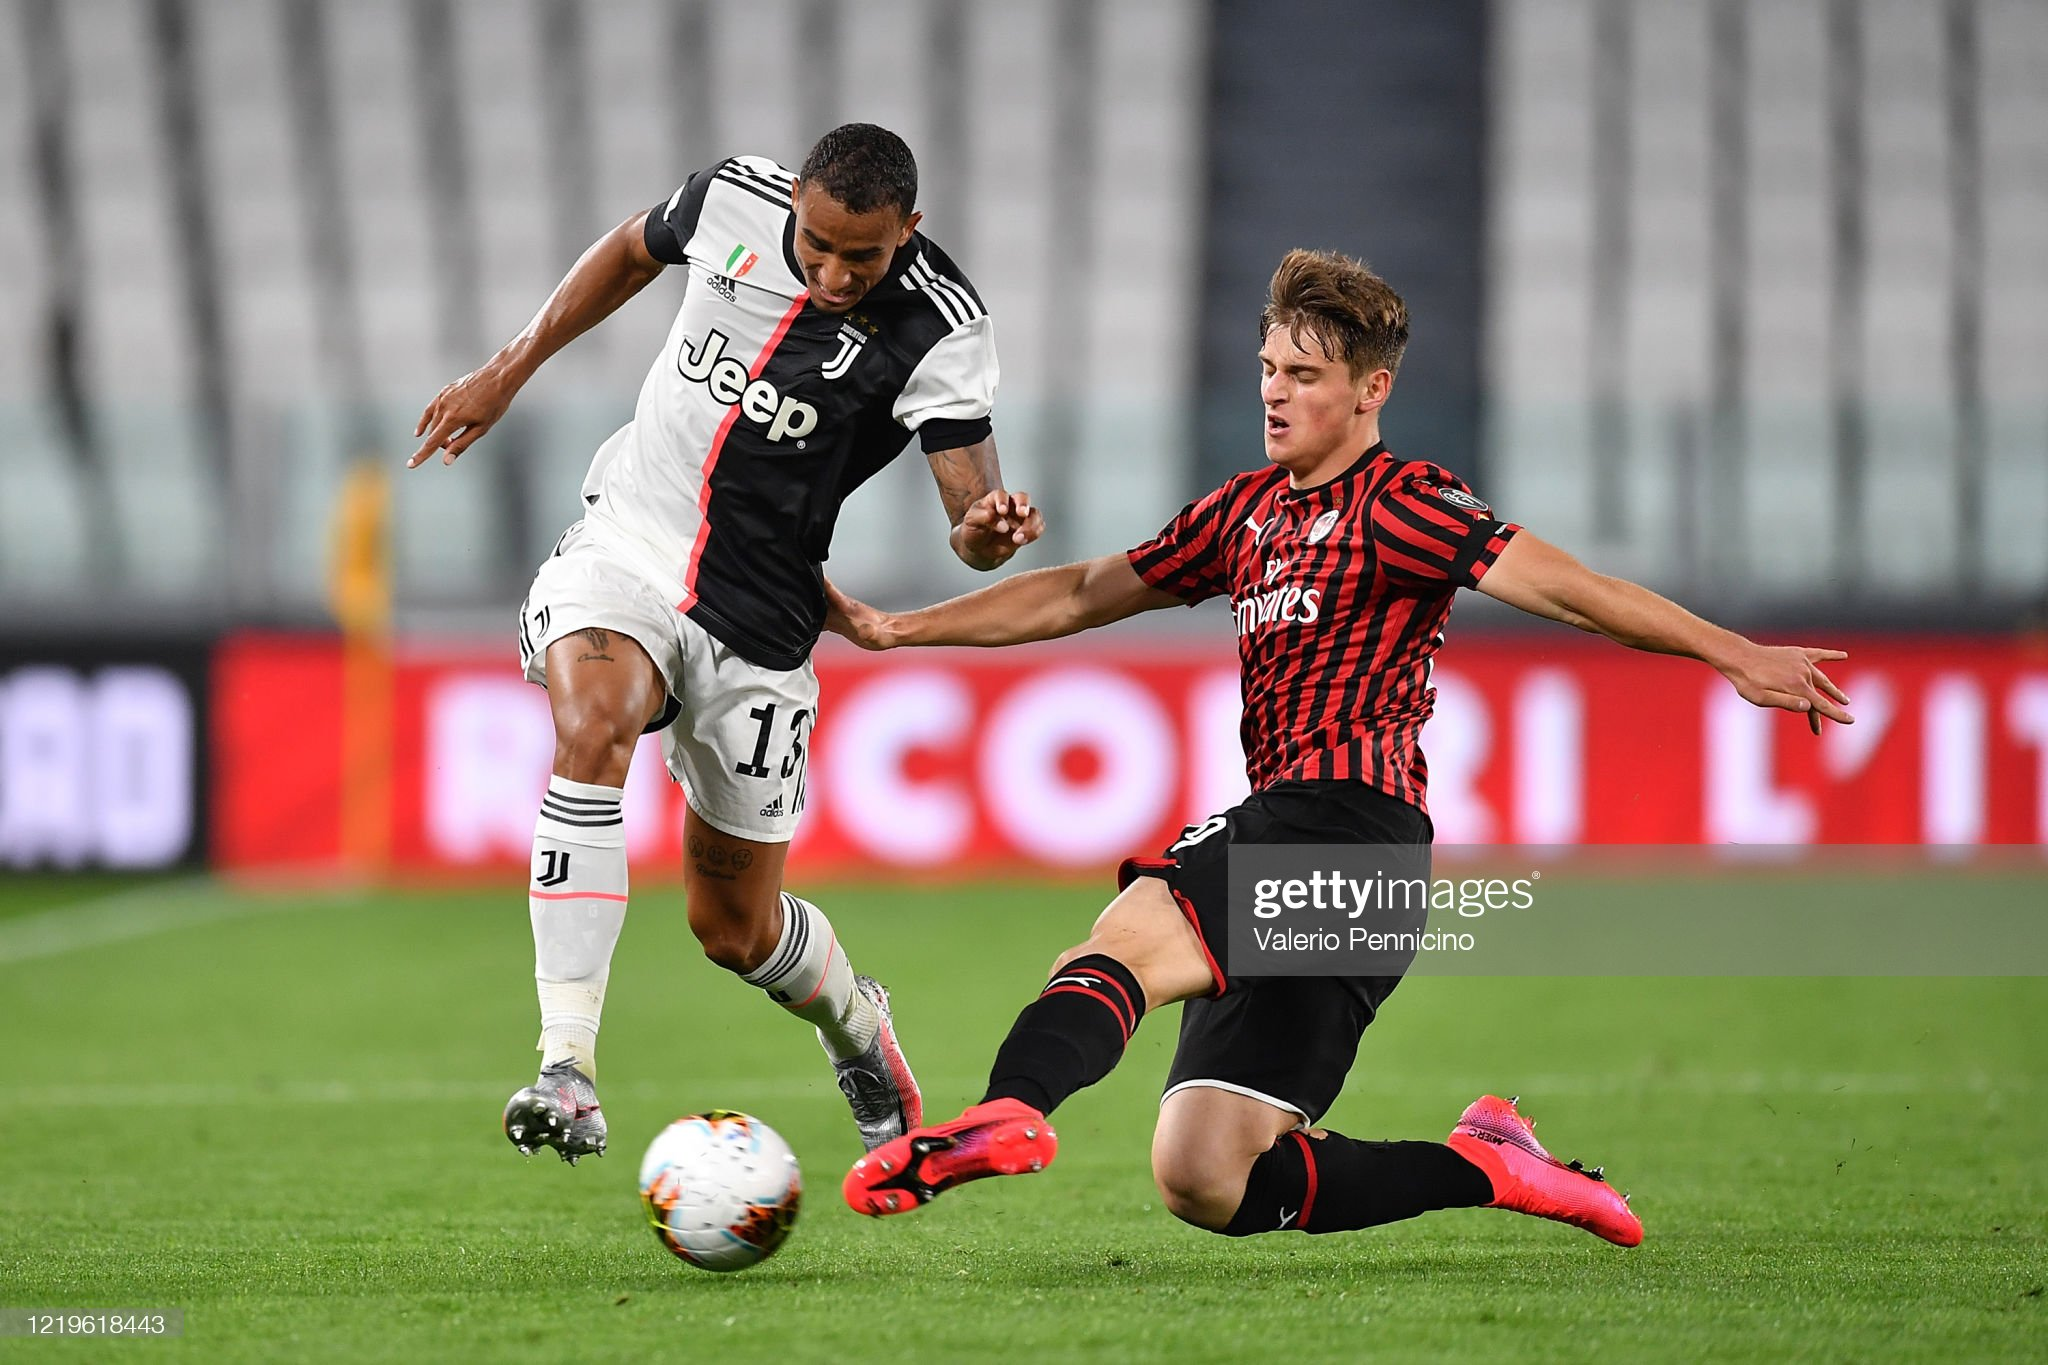 AC Milan vs Juventus Preview, prediction and odds